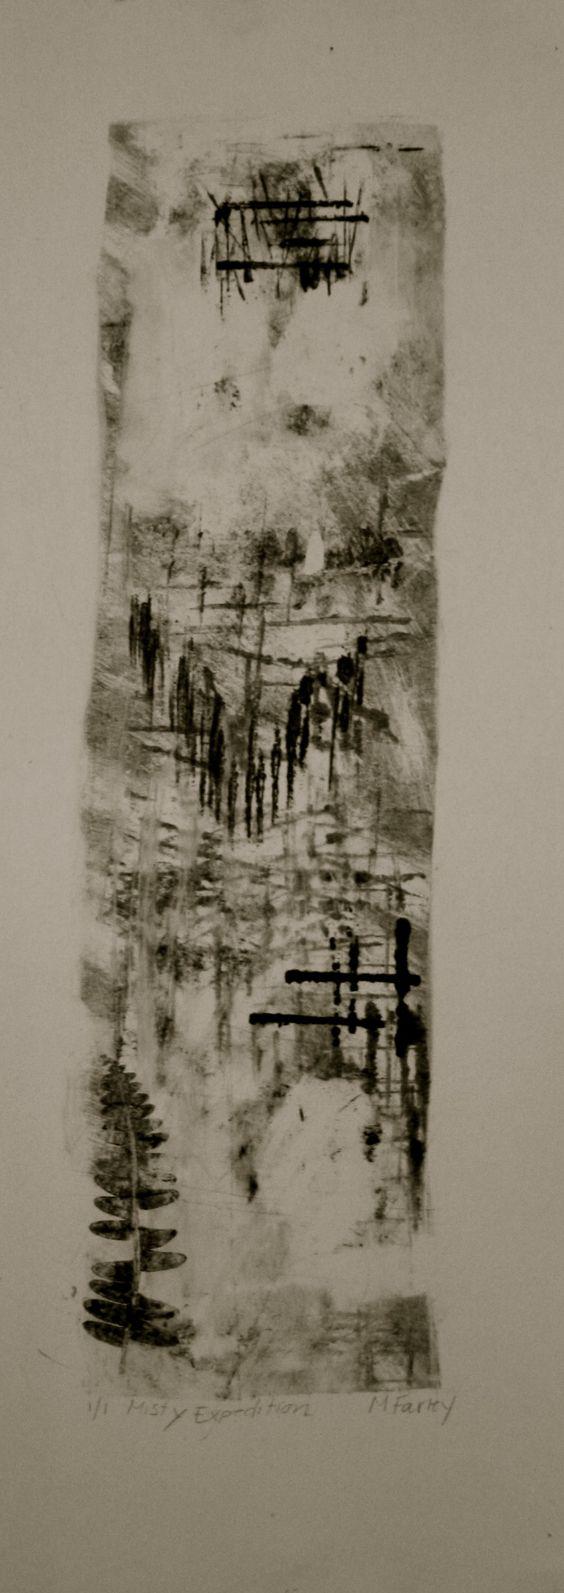 Printmaking-Abstract Monoprints.